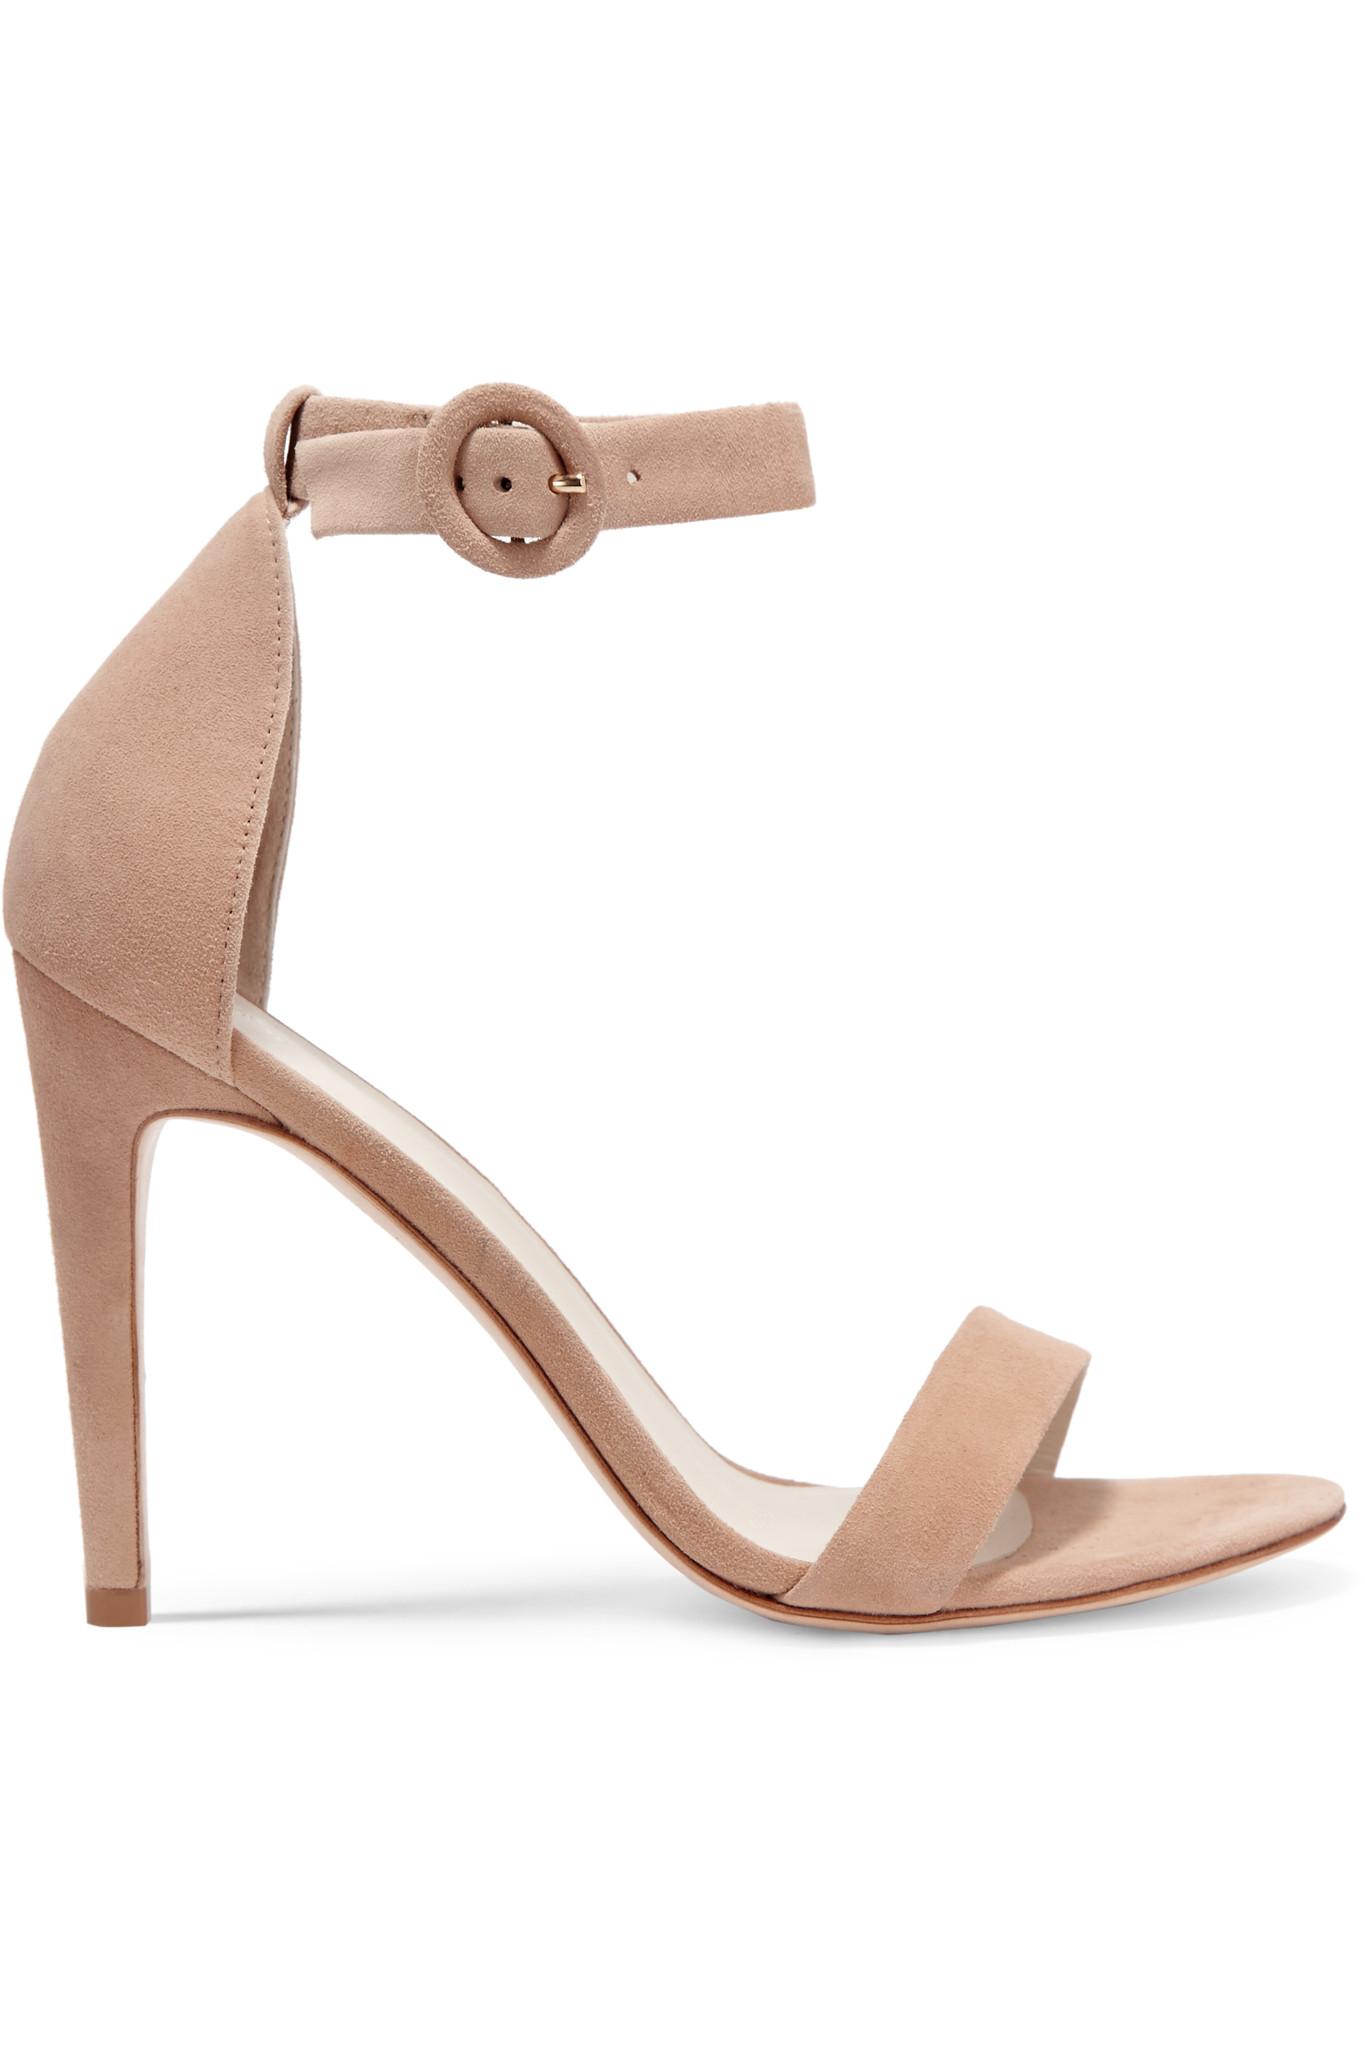 Boohoo Shoes Sizing True